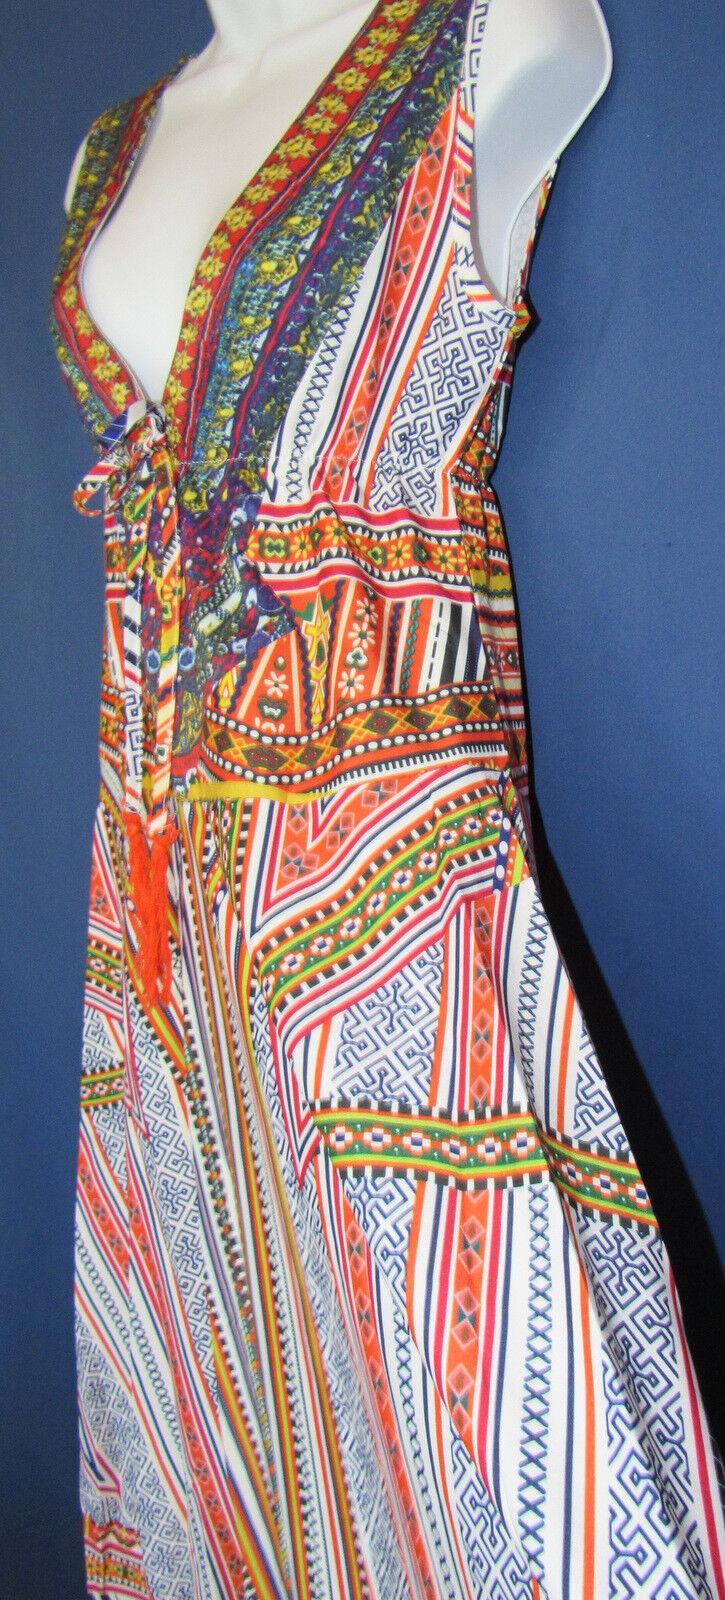 9f2c413713c ... Designer Designer Designer OSHOPLIVE Women s M Bohemian Gypsy Medieval  Fashion Long Dress New Tags e5c0e5 ...